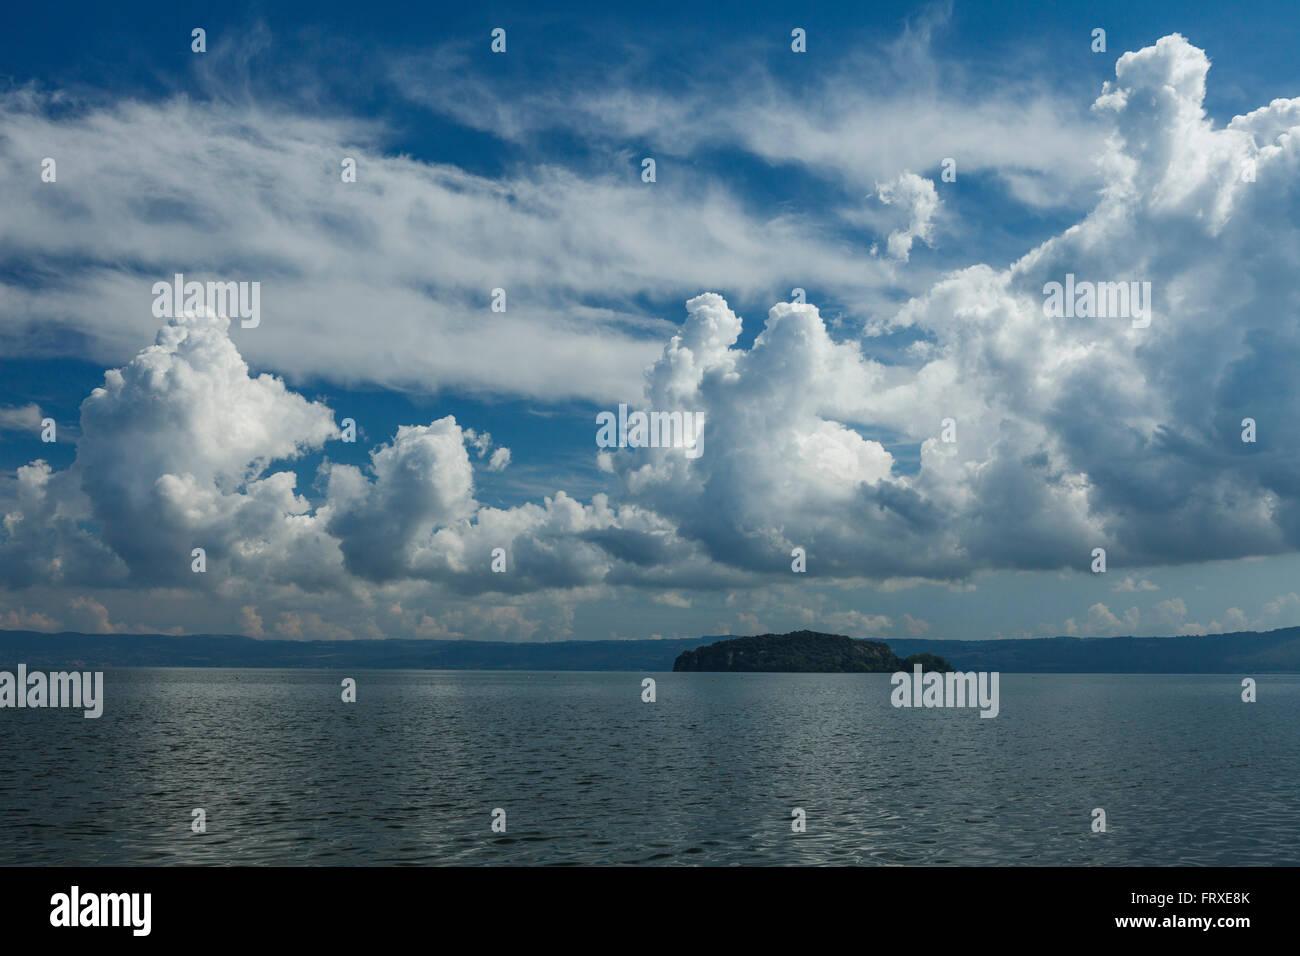 Cumulus clouds above lake Lago di Bolsena, Isola Martana im Hintergrund, crater lake of volcanic origin, near Montefiascone, - Stock Image